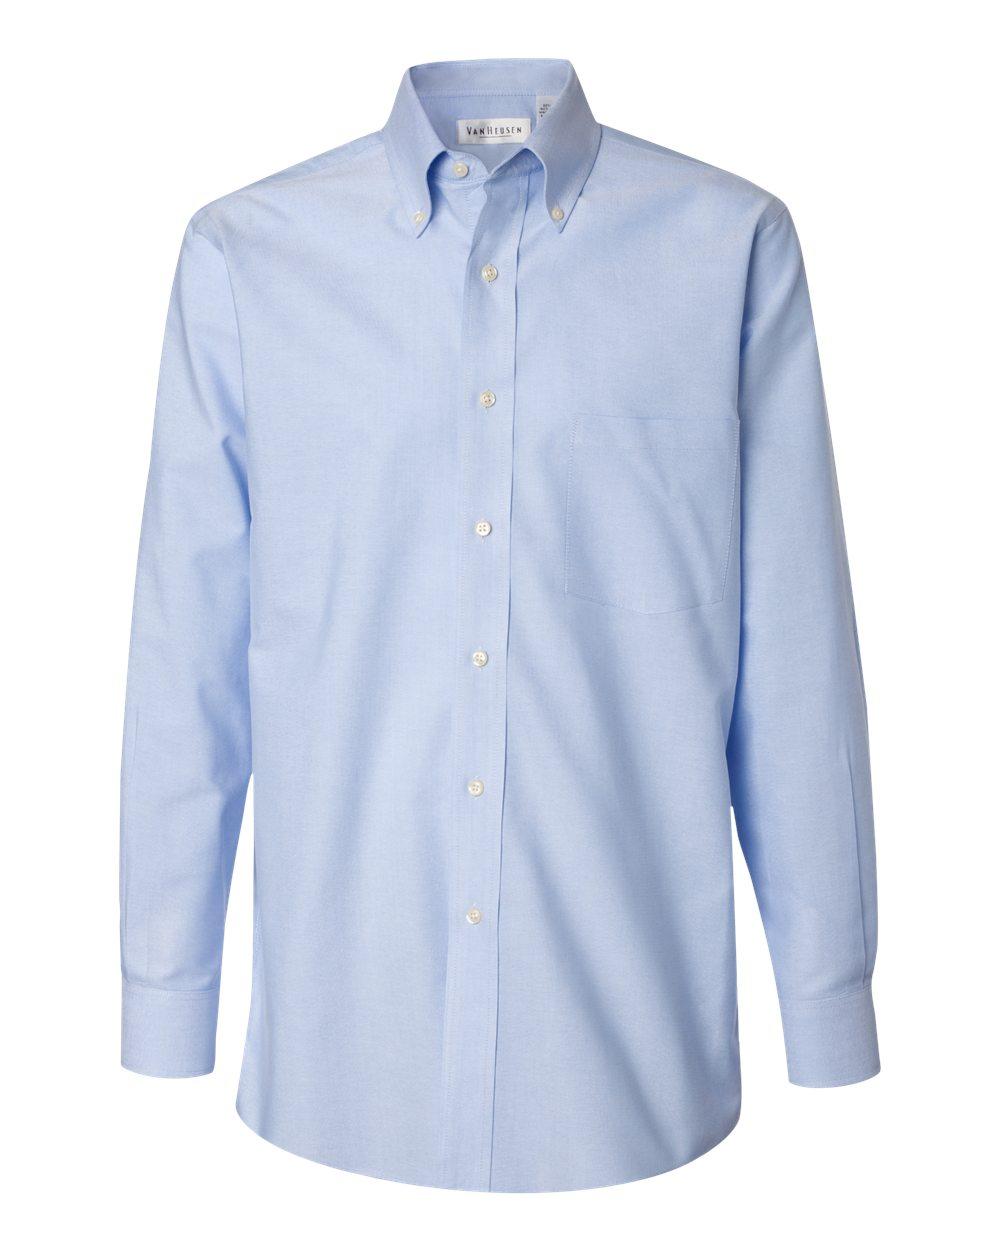 Van heusen men 39 s pinpoint oxford shirt 13v0067 for Van heusen dress shirts